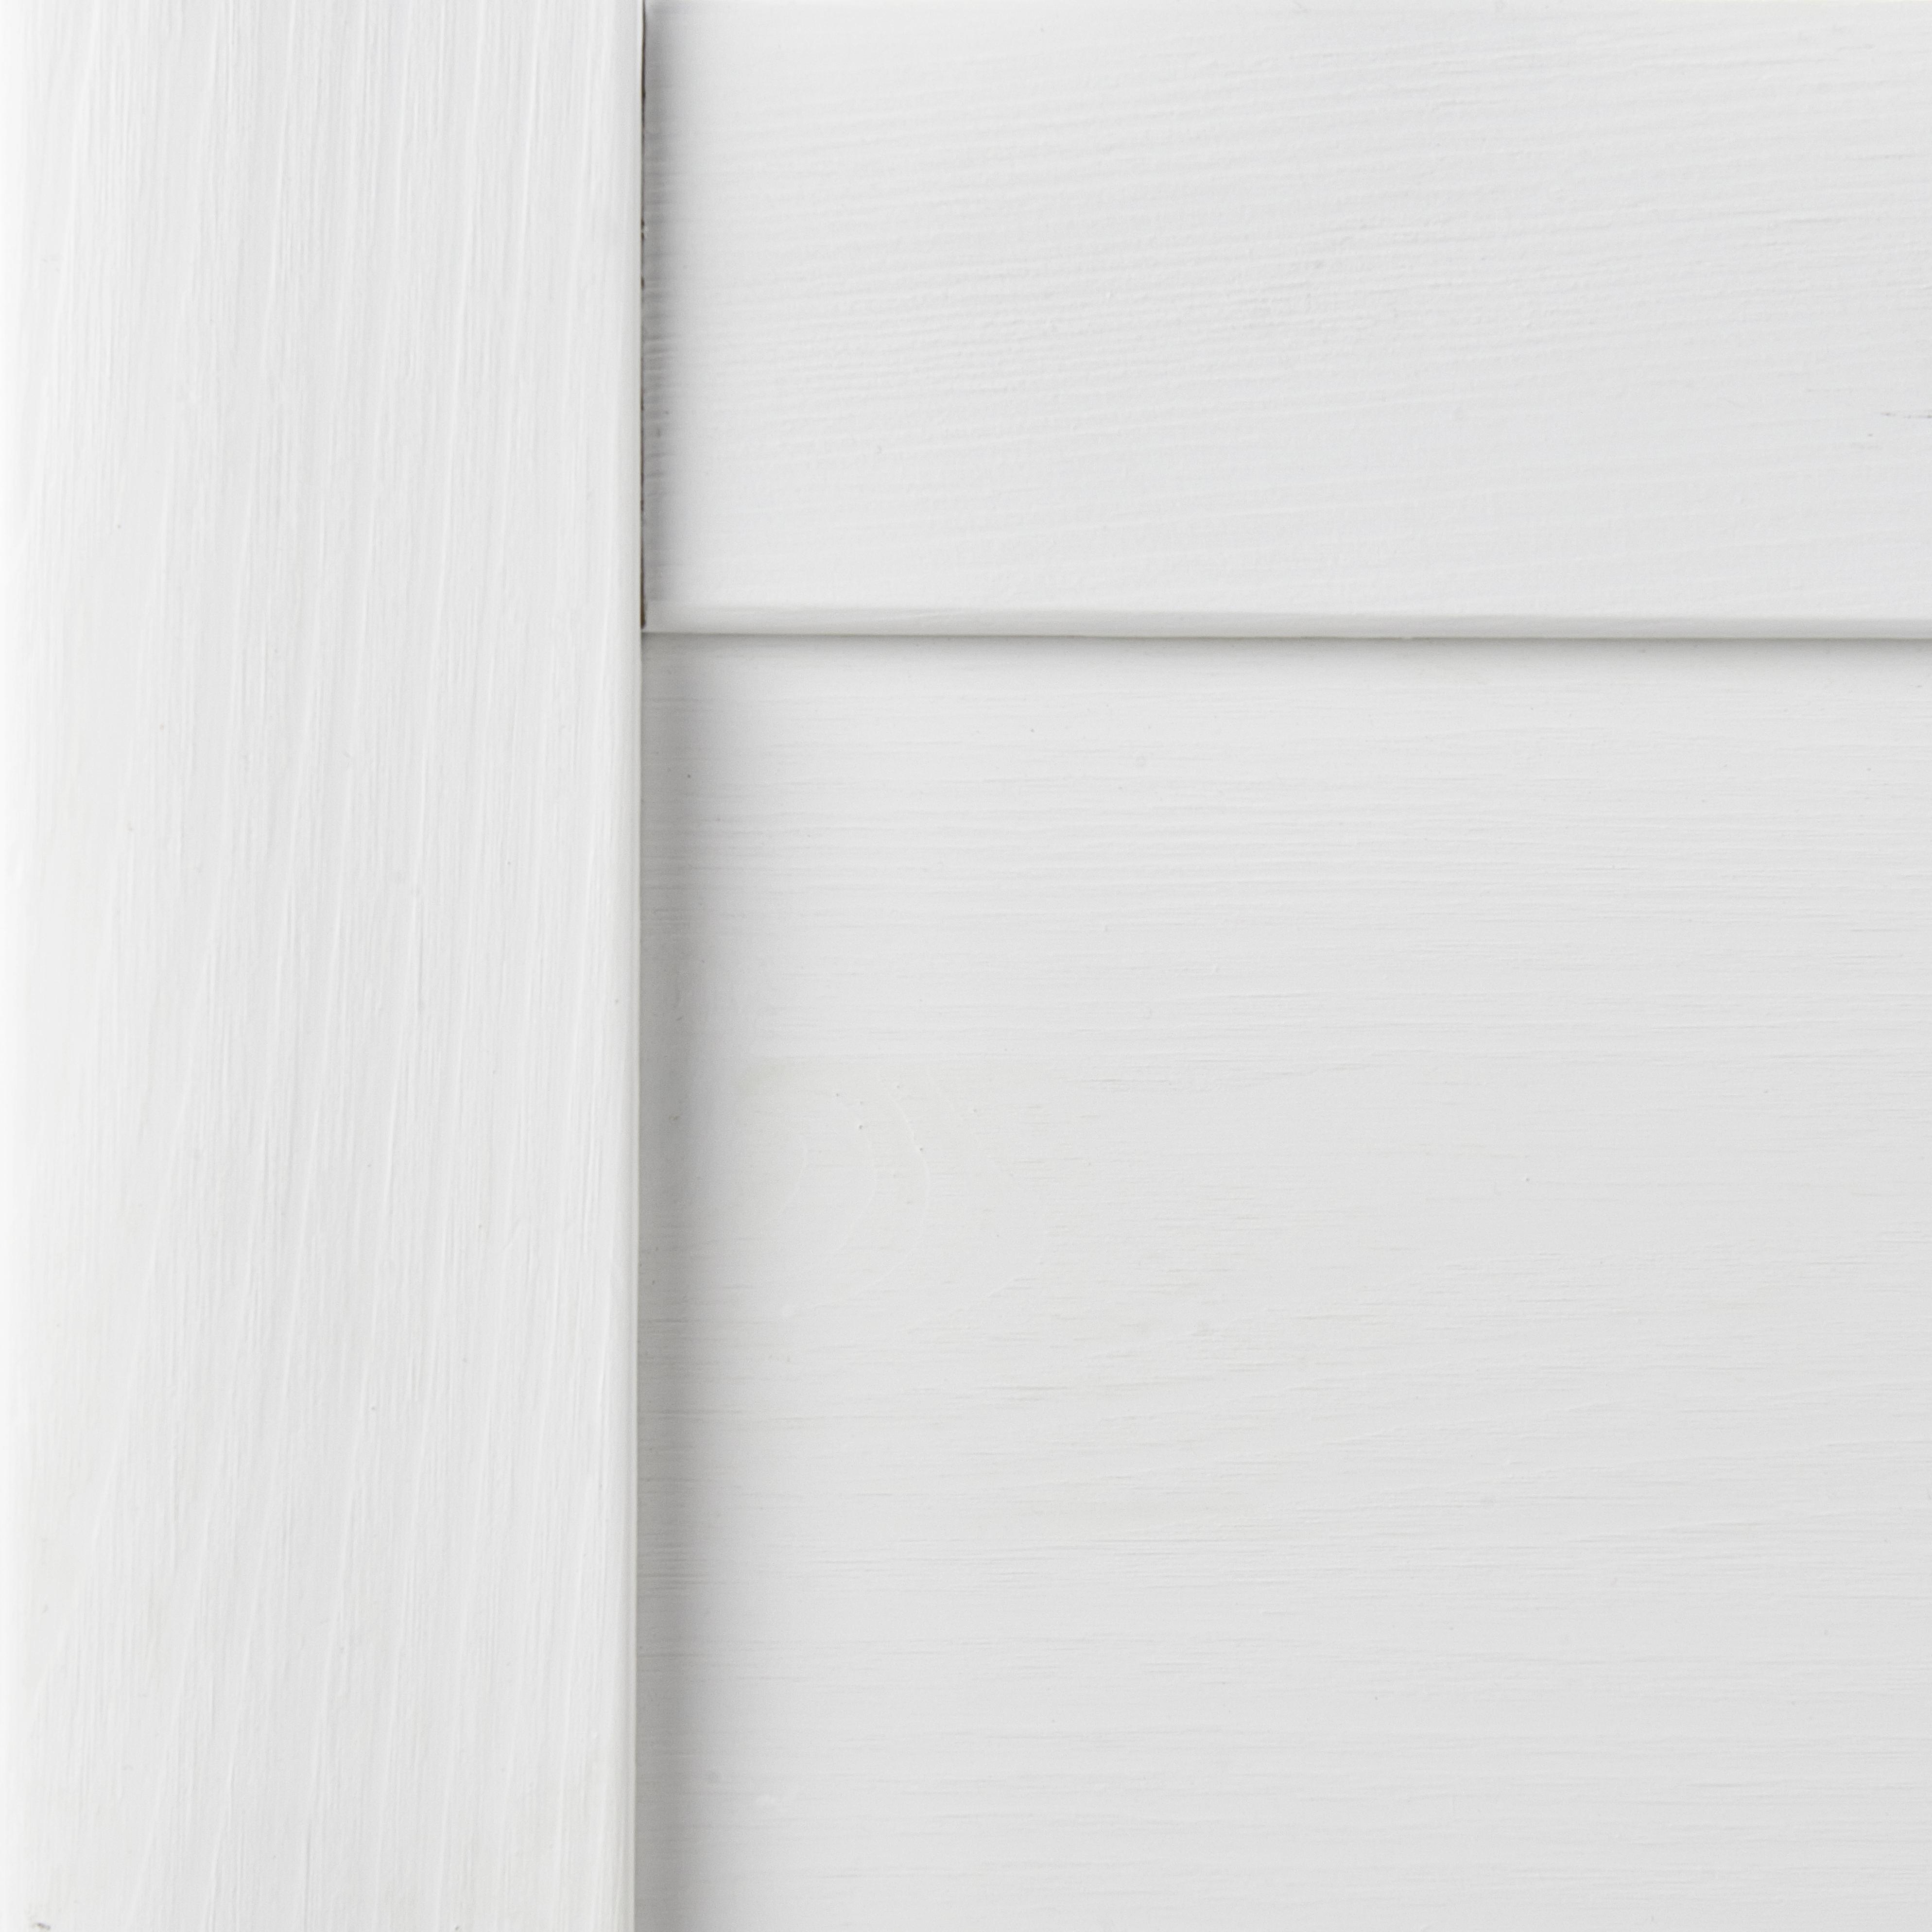 Holzbett Pina 180x200cm - Weiß, KONVENTIONELL, Holz (191/64/90/211cm) - MÖMAX modern living